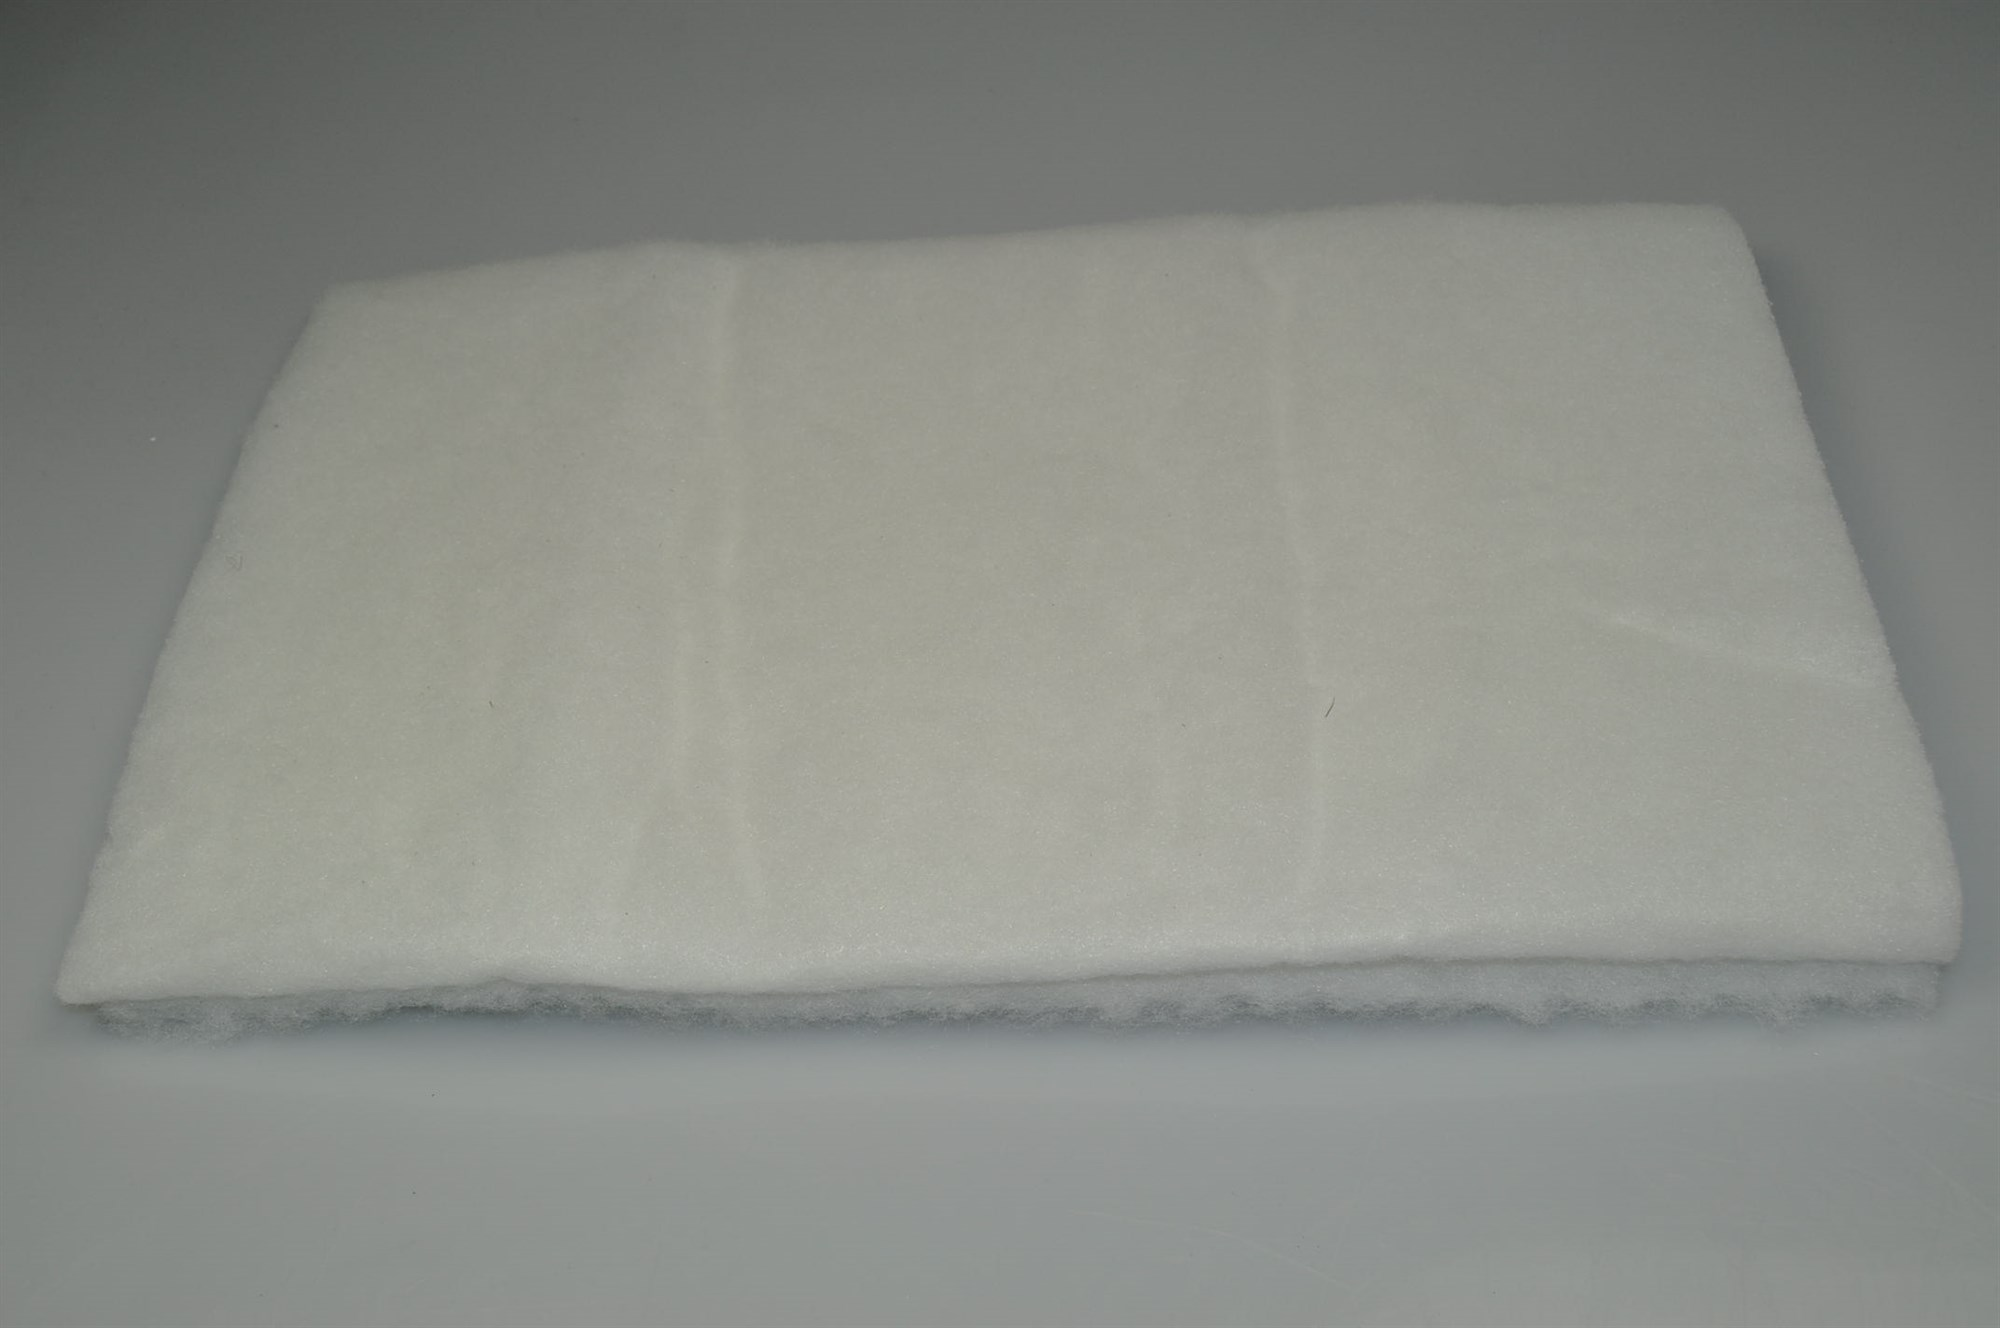 Fettfilter universal dunstabzugshaube mm mm